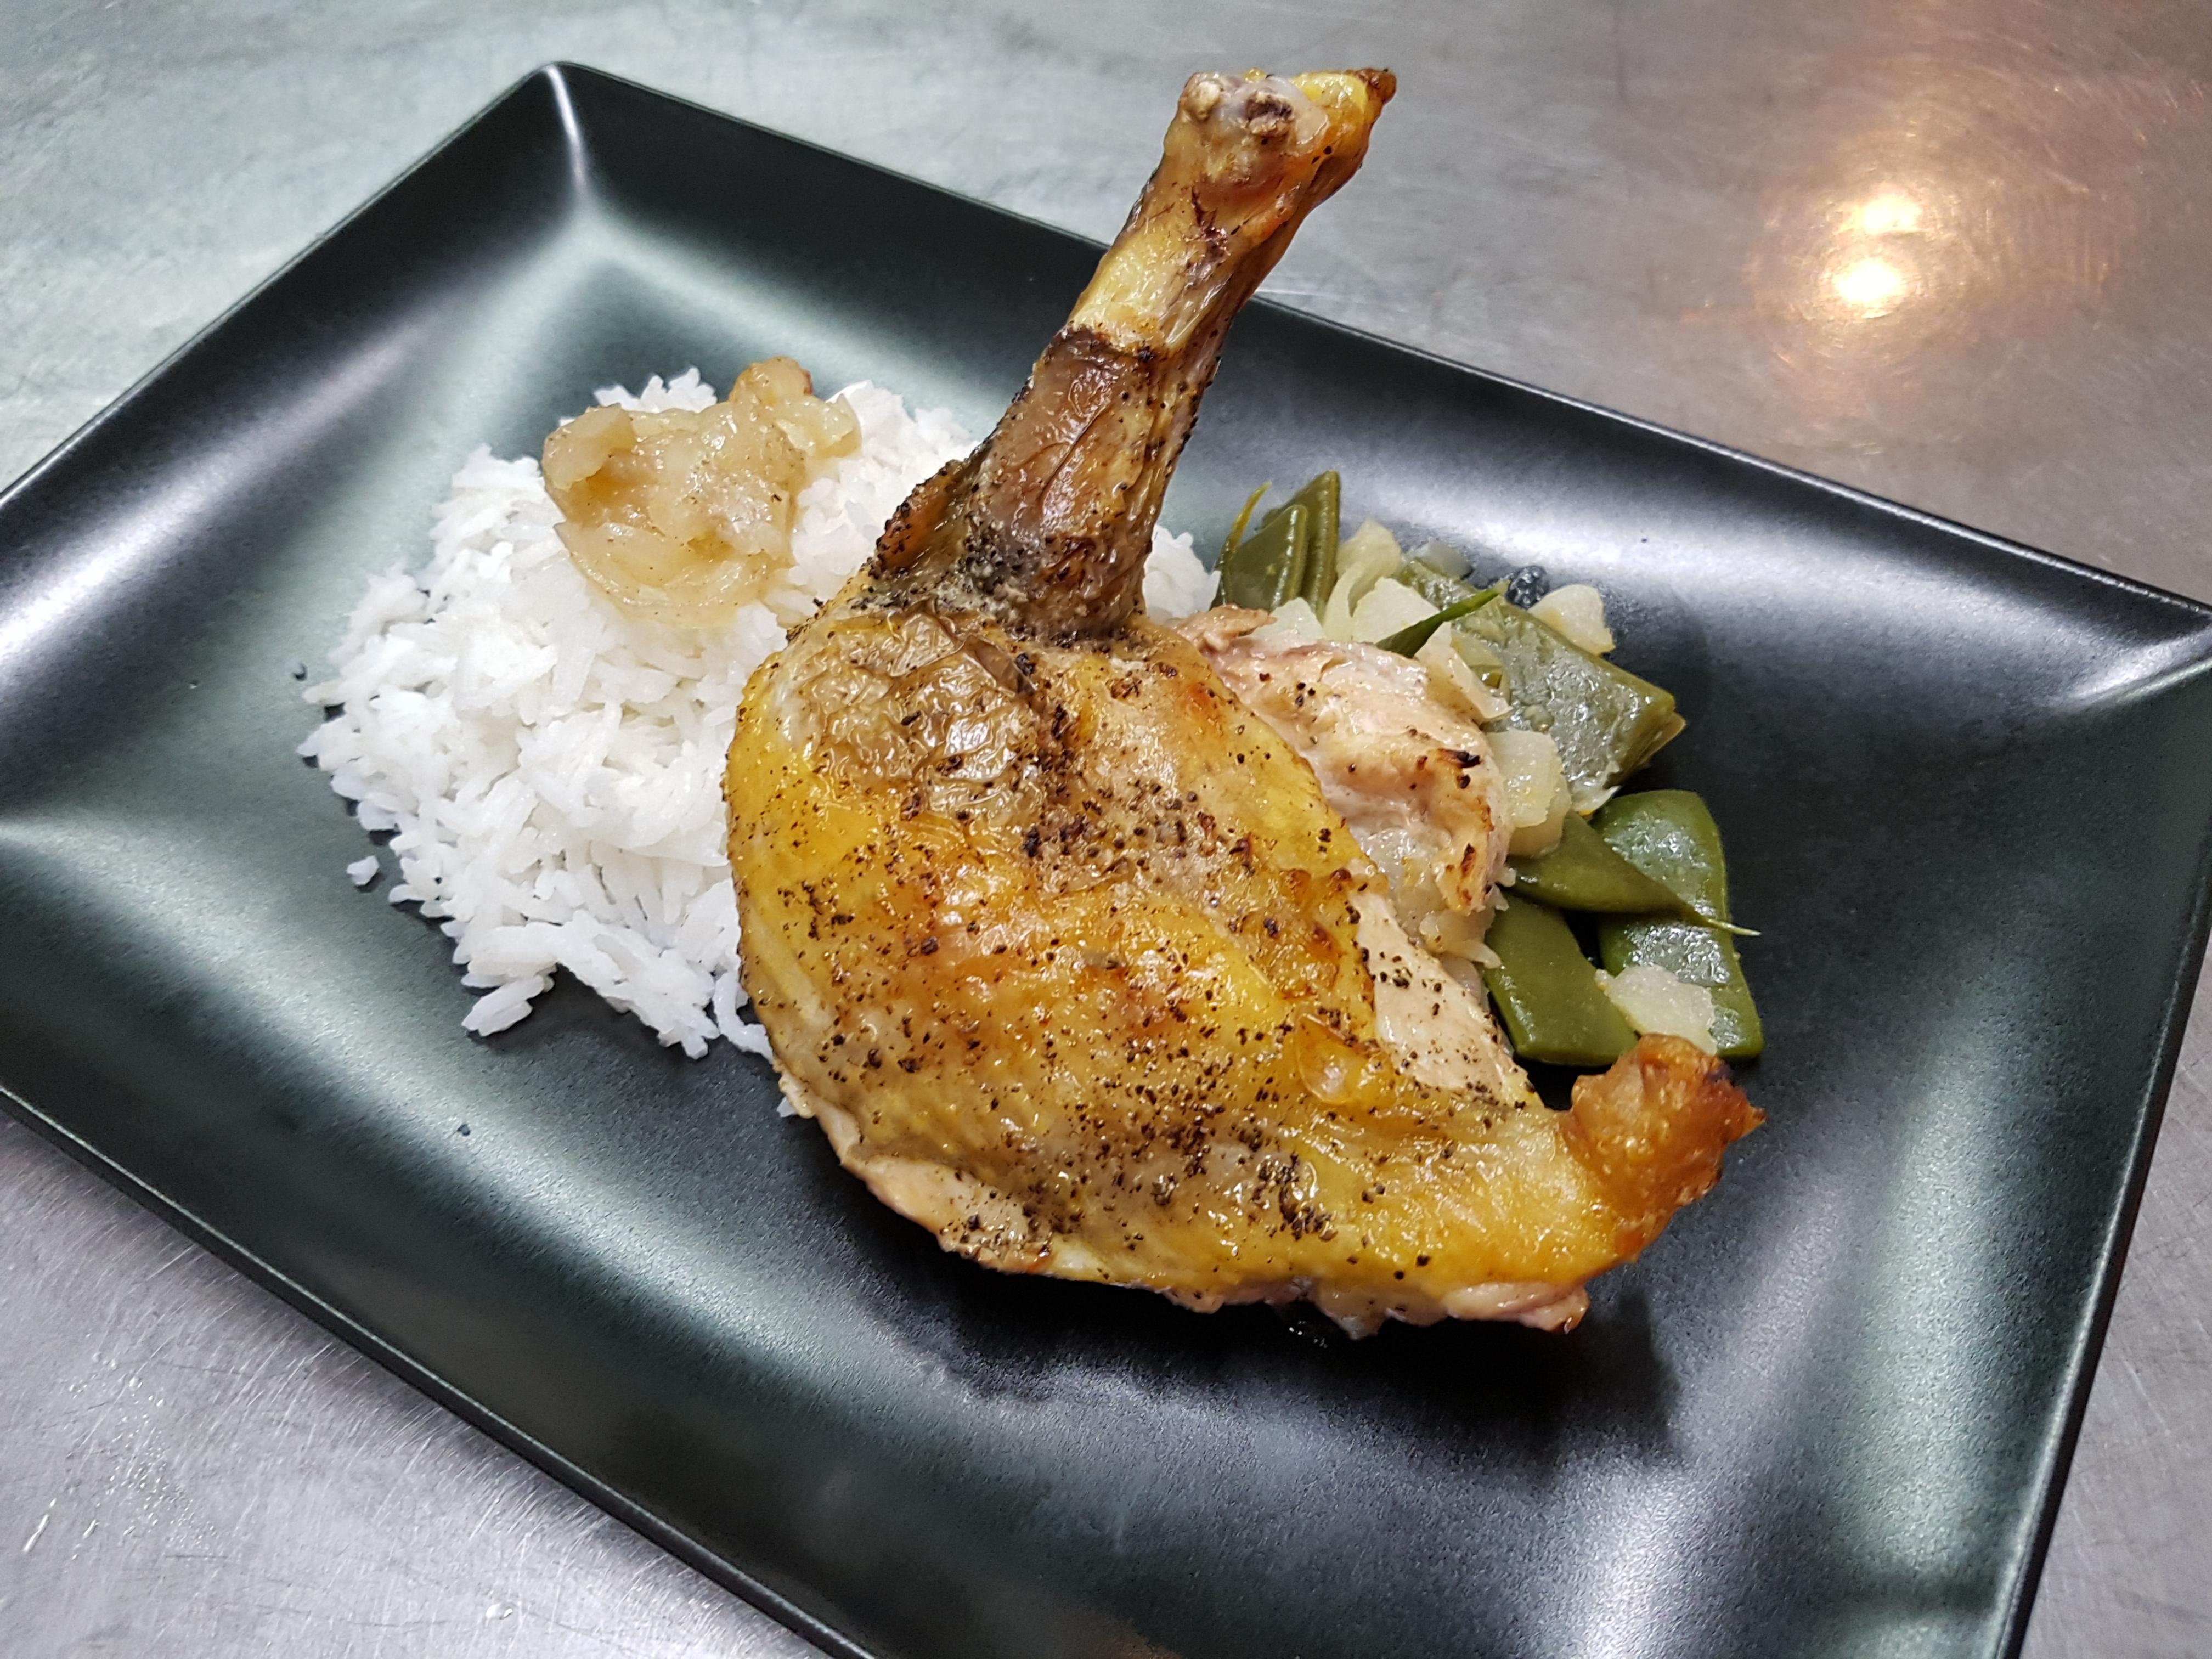 cuisse de pintade grillée, riz